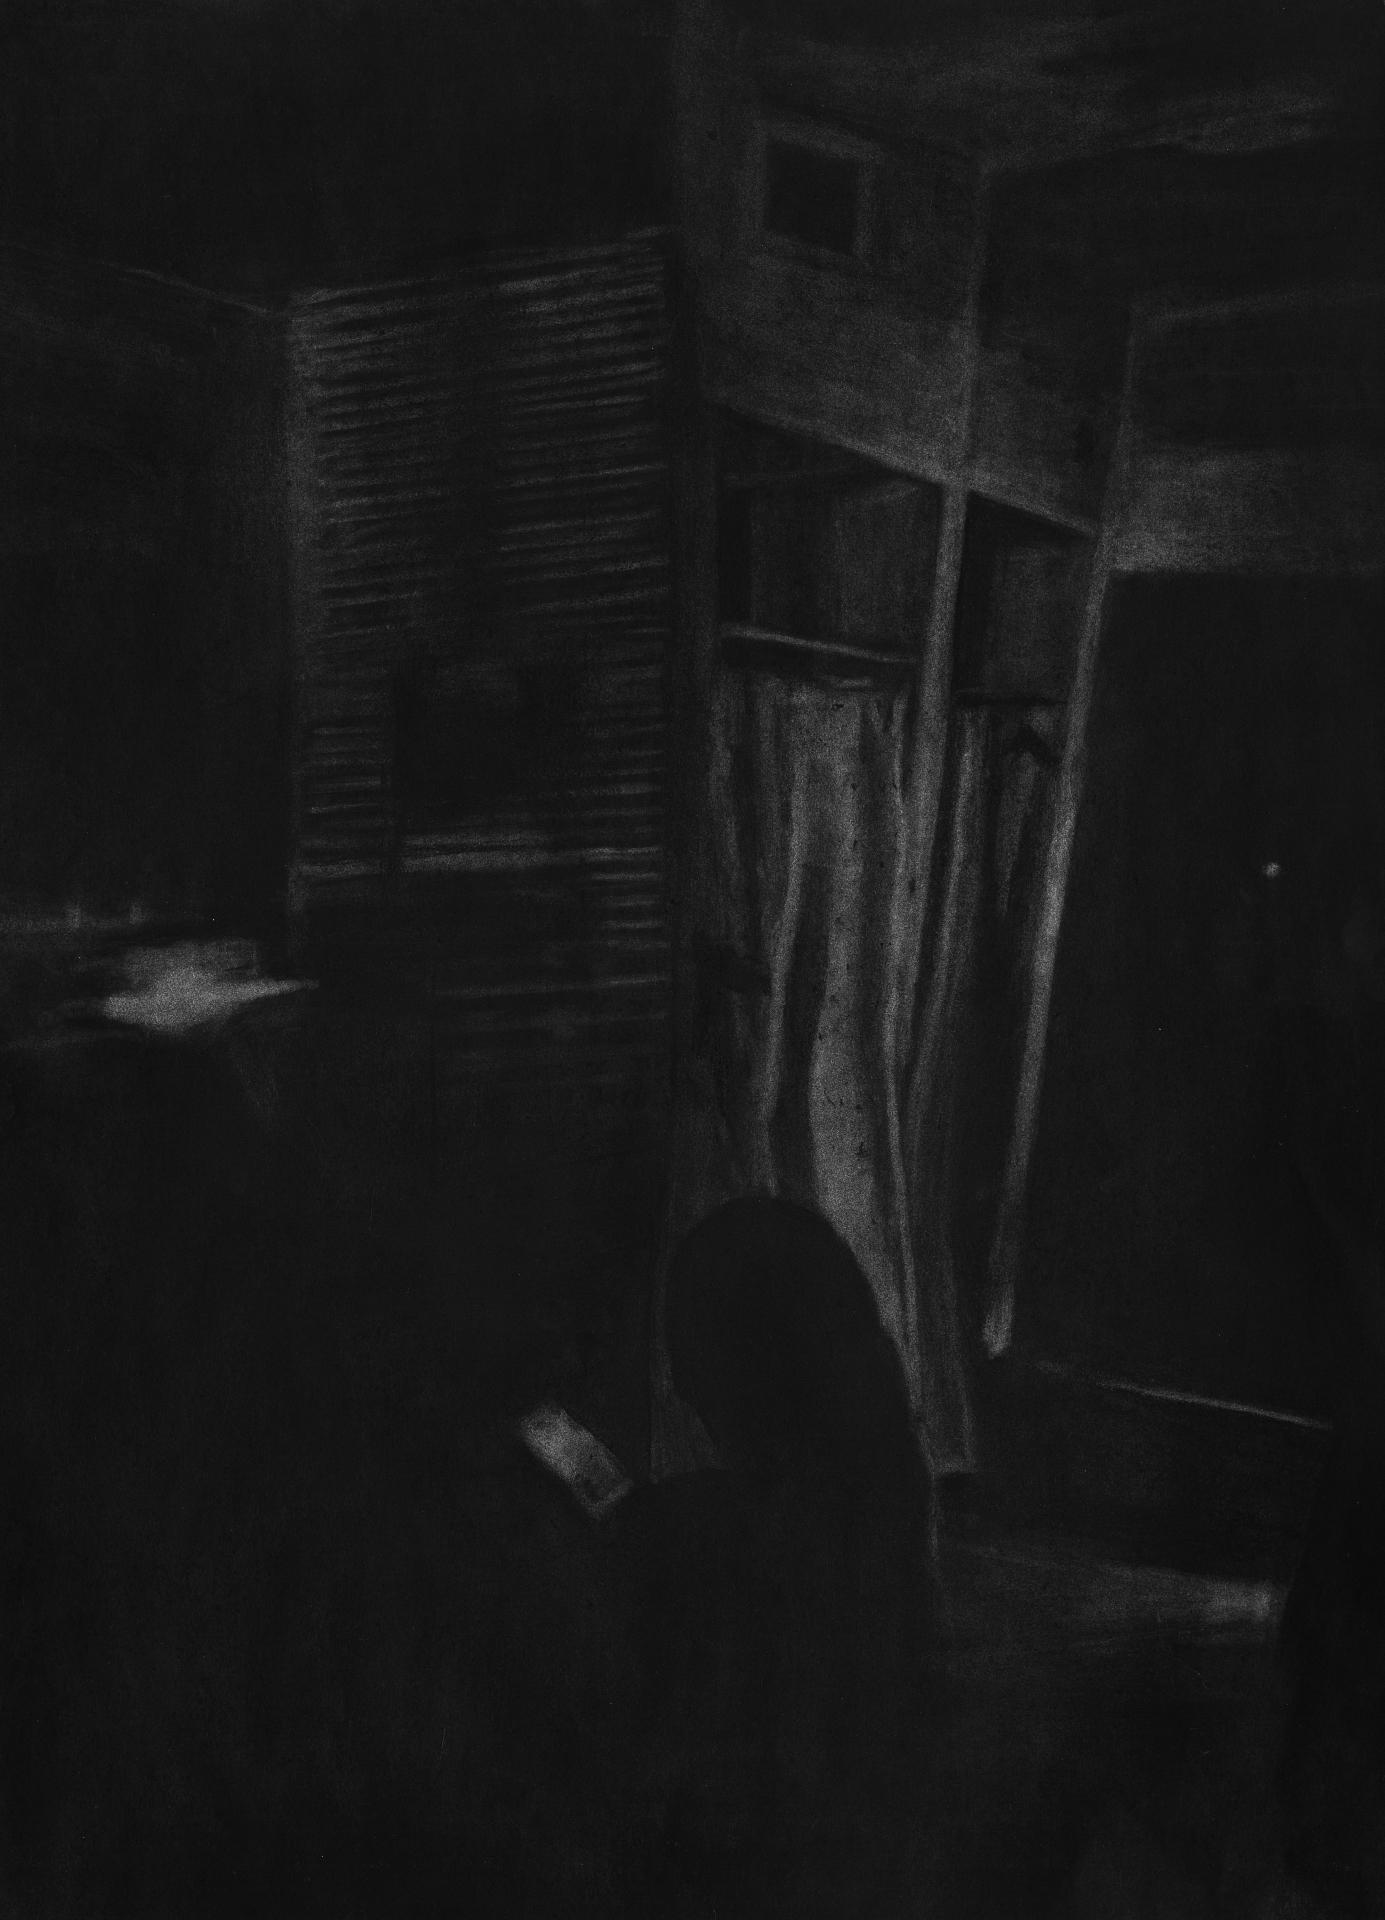 Kaydee Stant, Erased Night